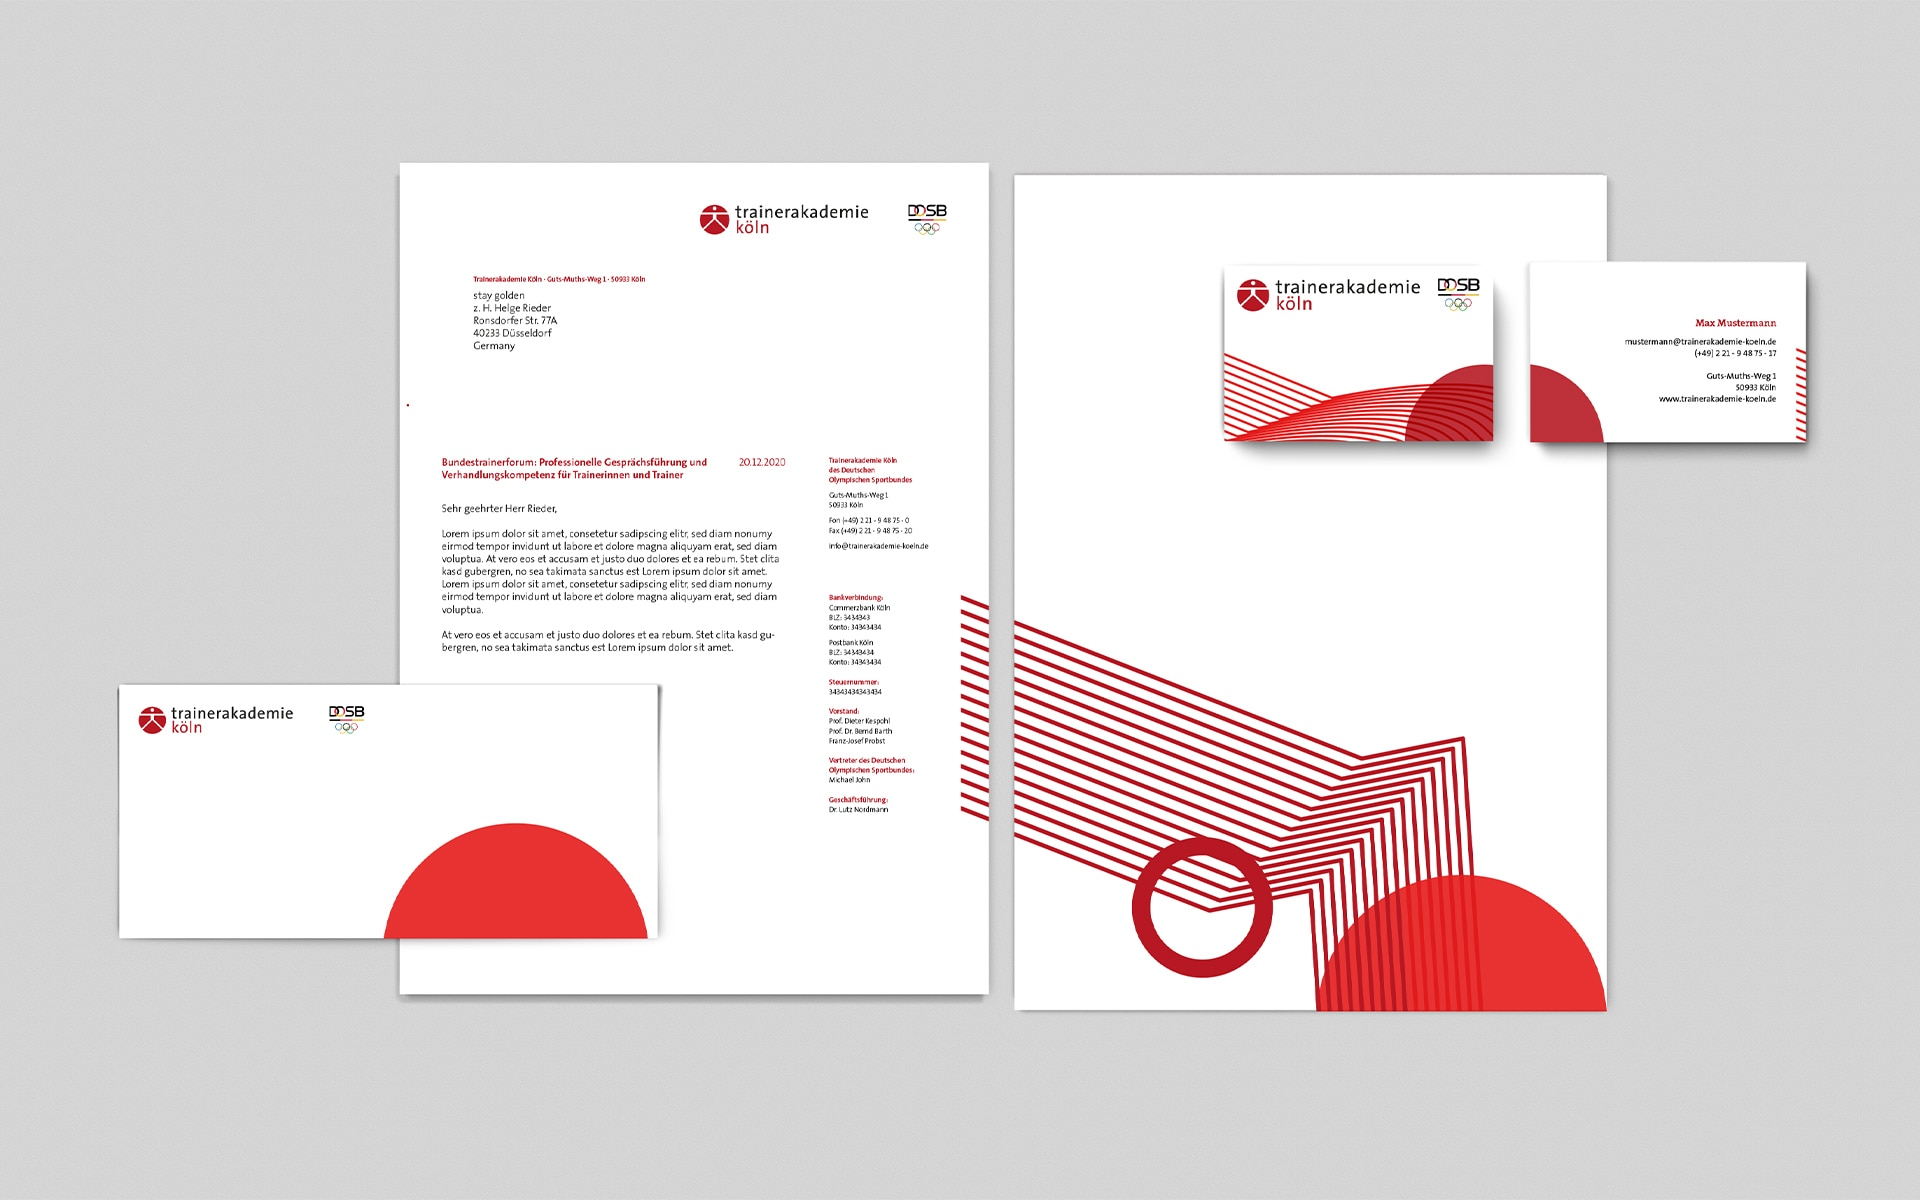 Trainerakademie Köln Corporate Design, Geschäftsausstattung